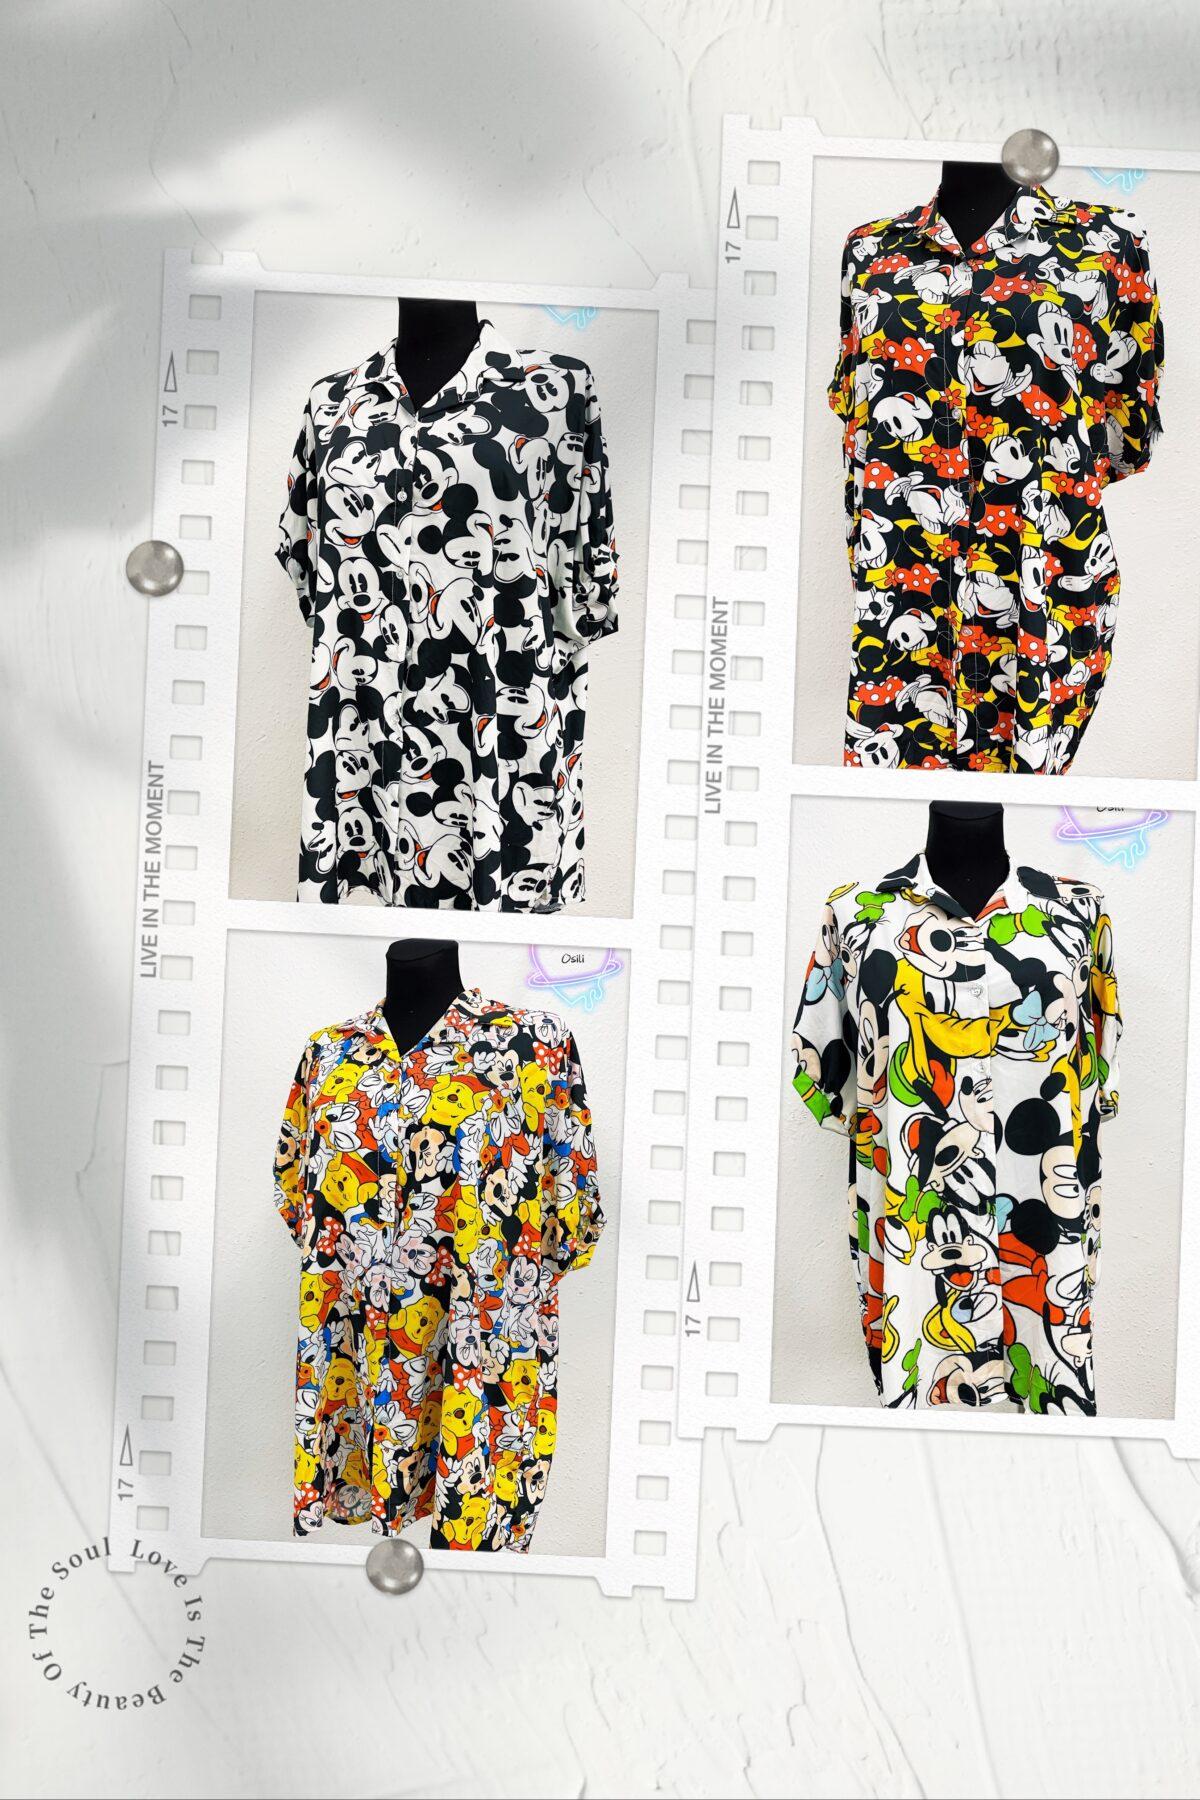 BC3FAA57 6C1A 46AF 8557 E38A3E1FCA5A scaled Osili - Fashion - Divat